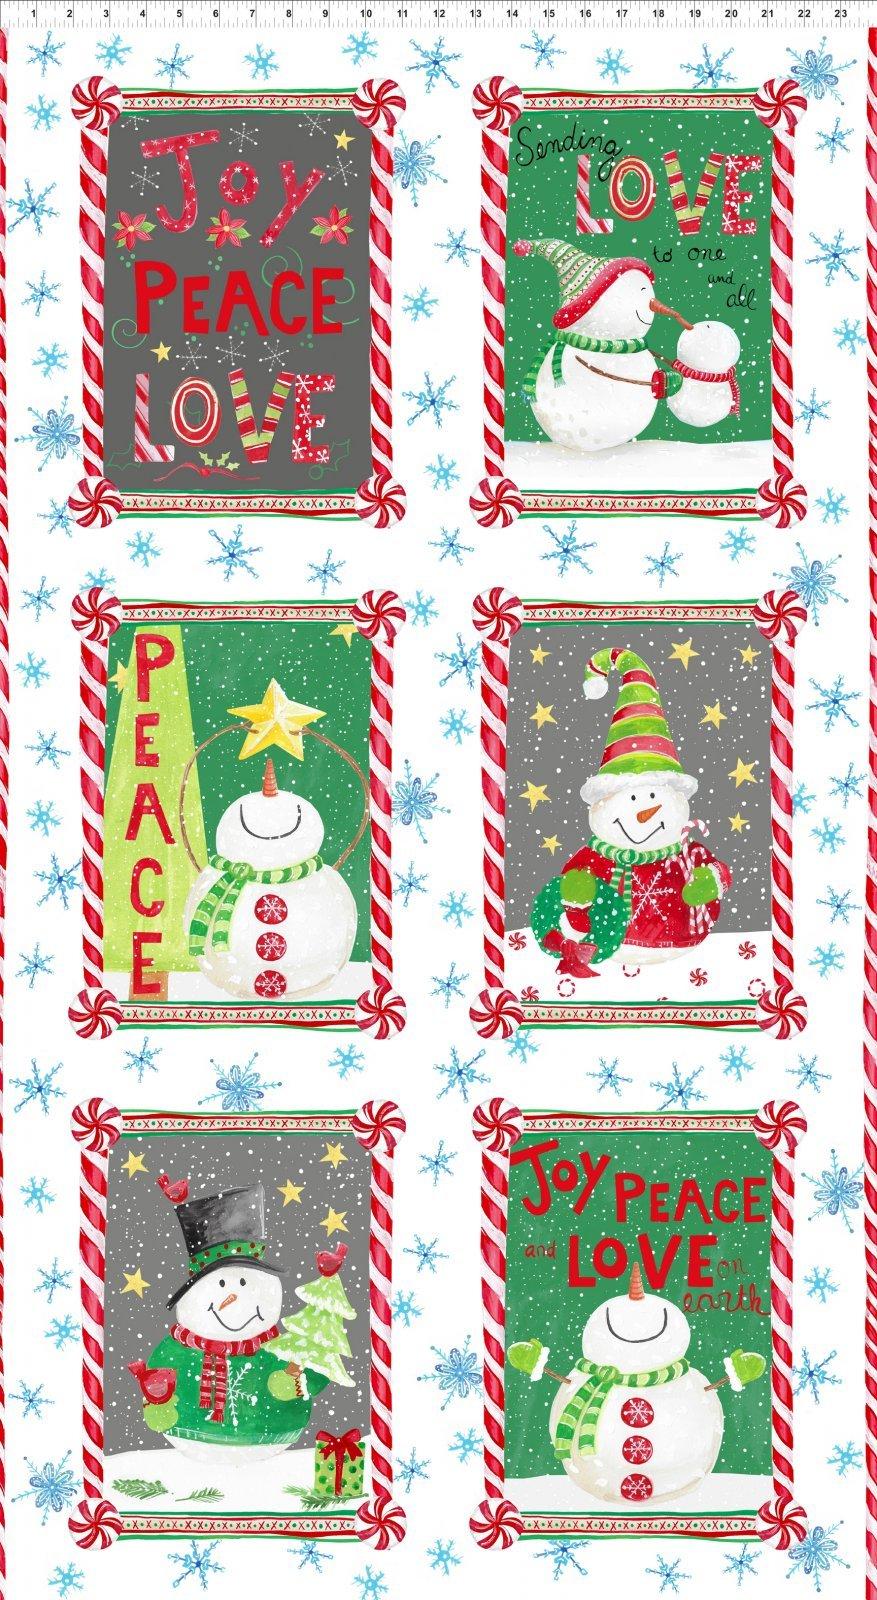 Joy Peace and Love - snowman panel